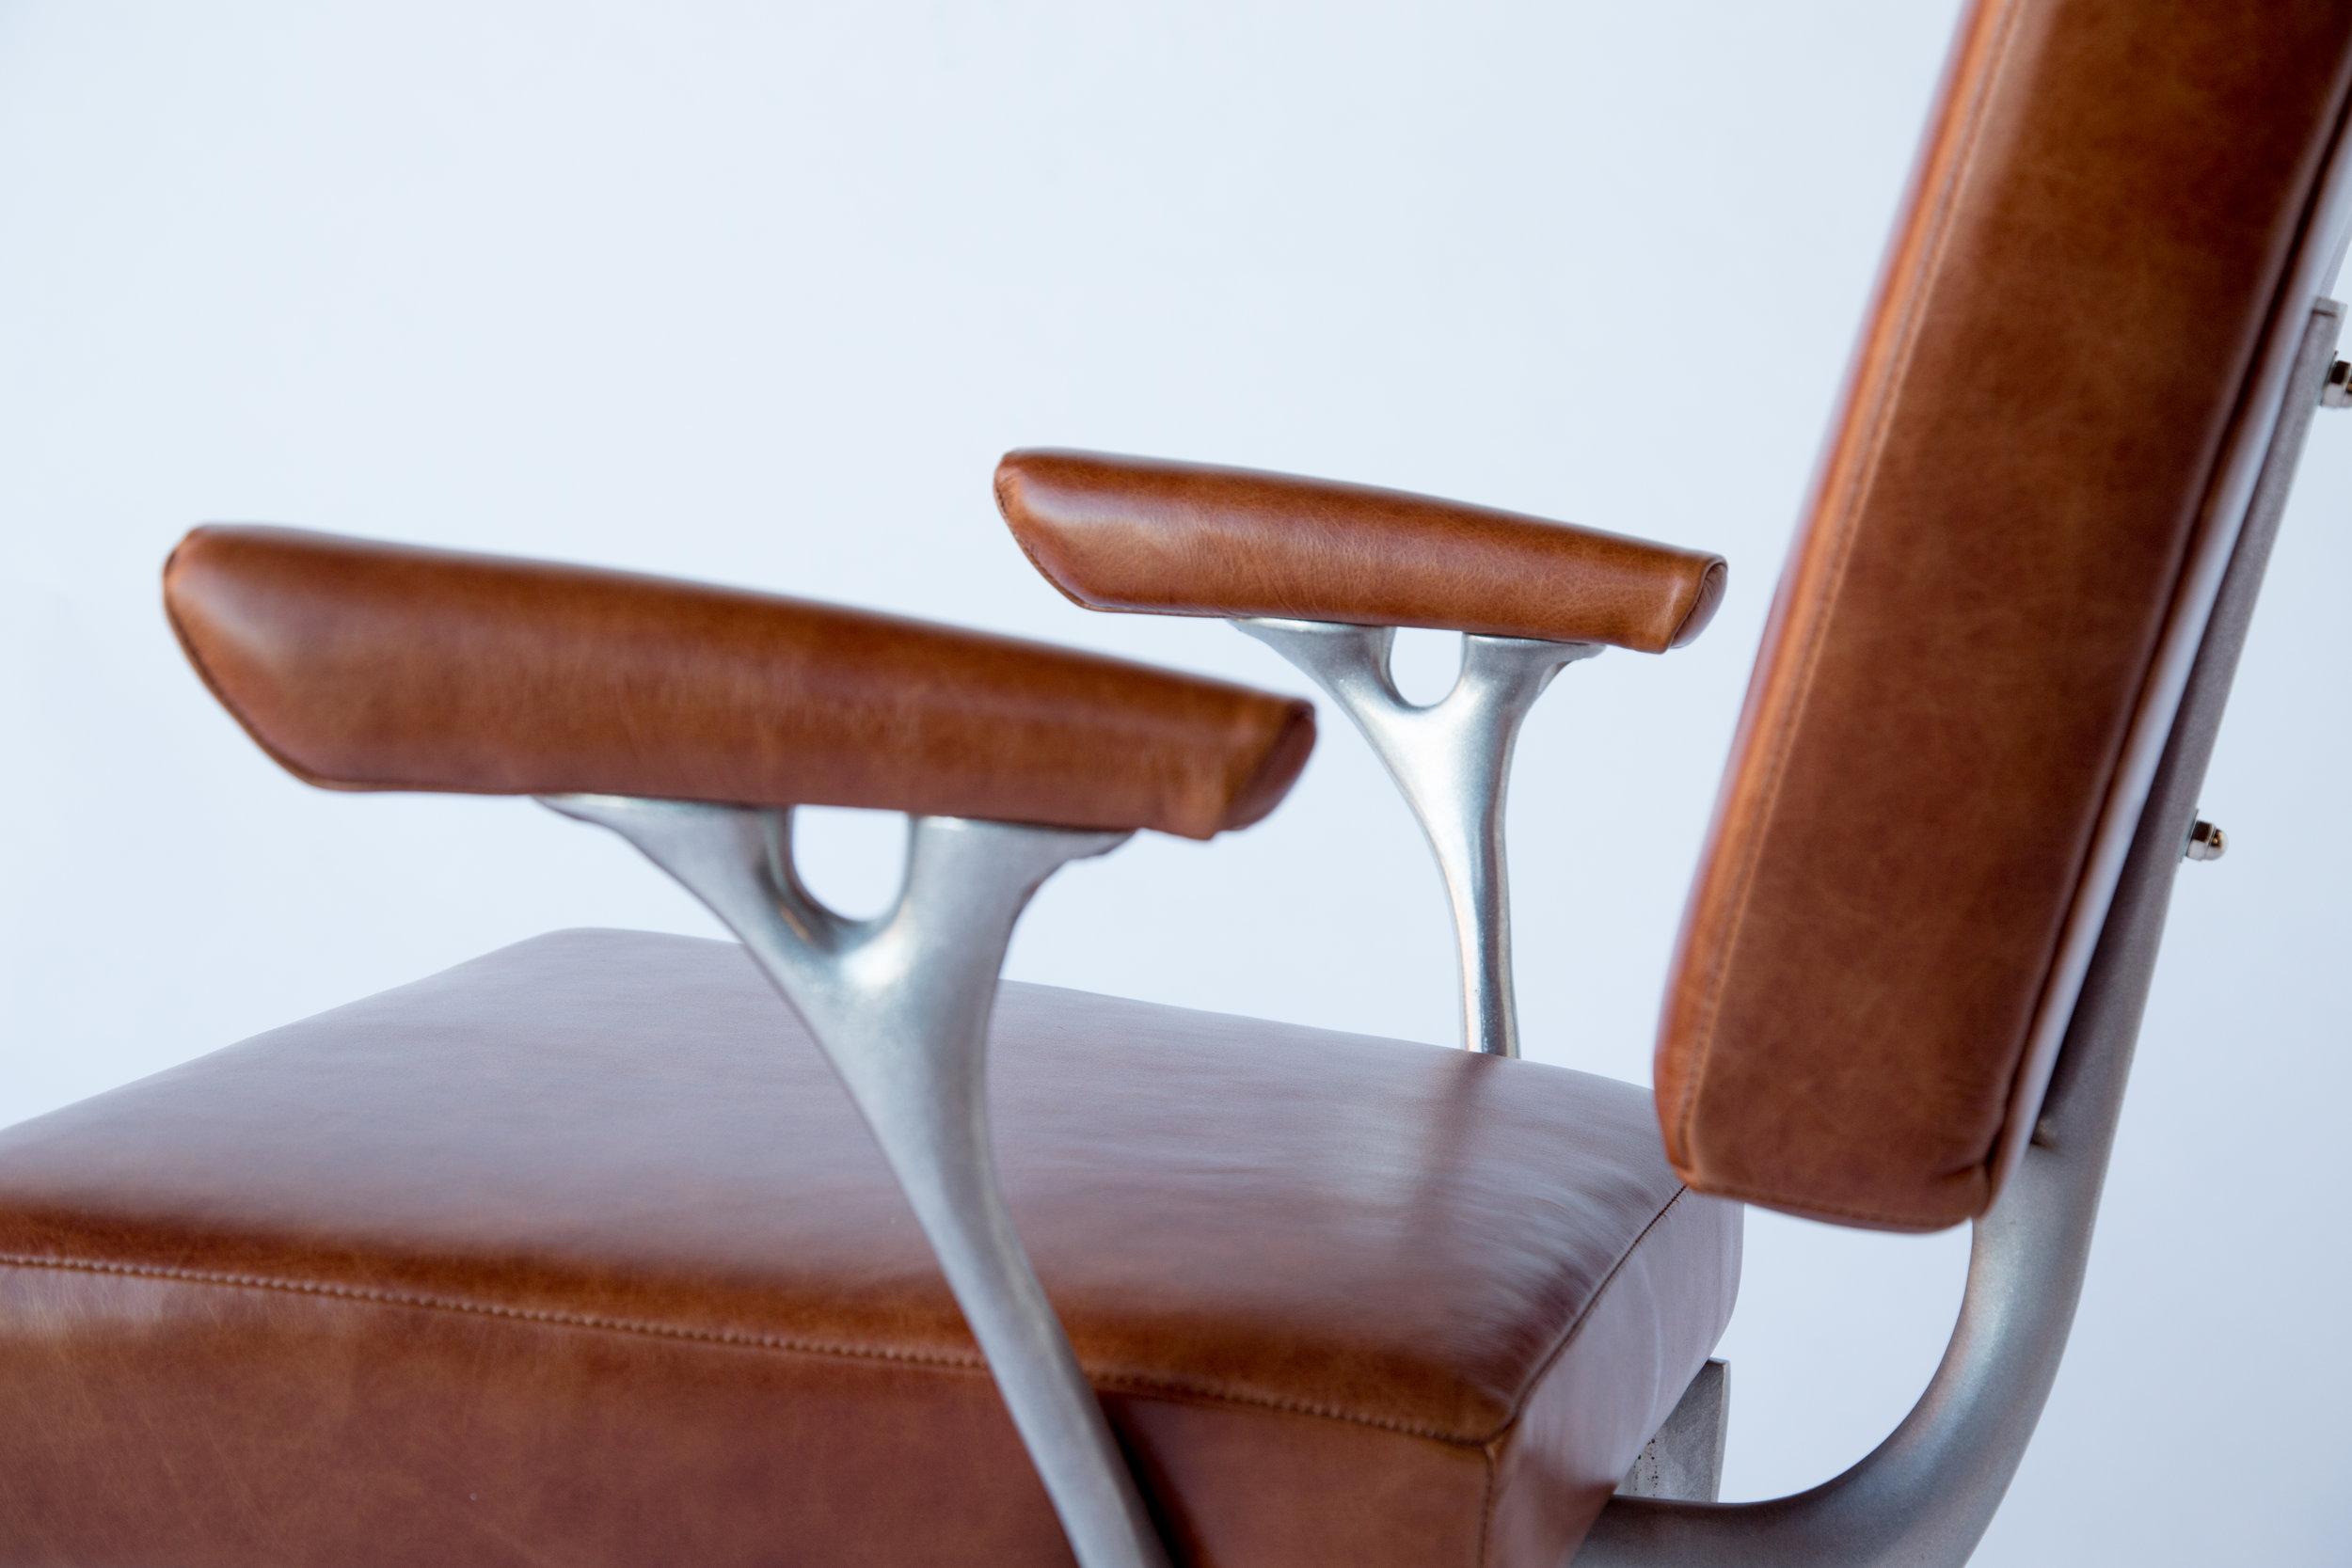 Twig Chair Light-10.jpg